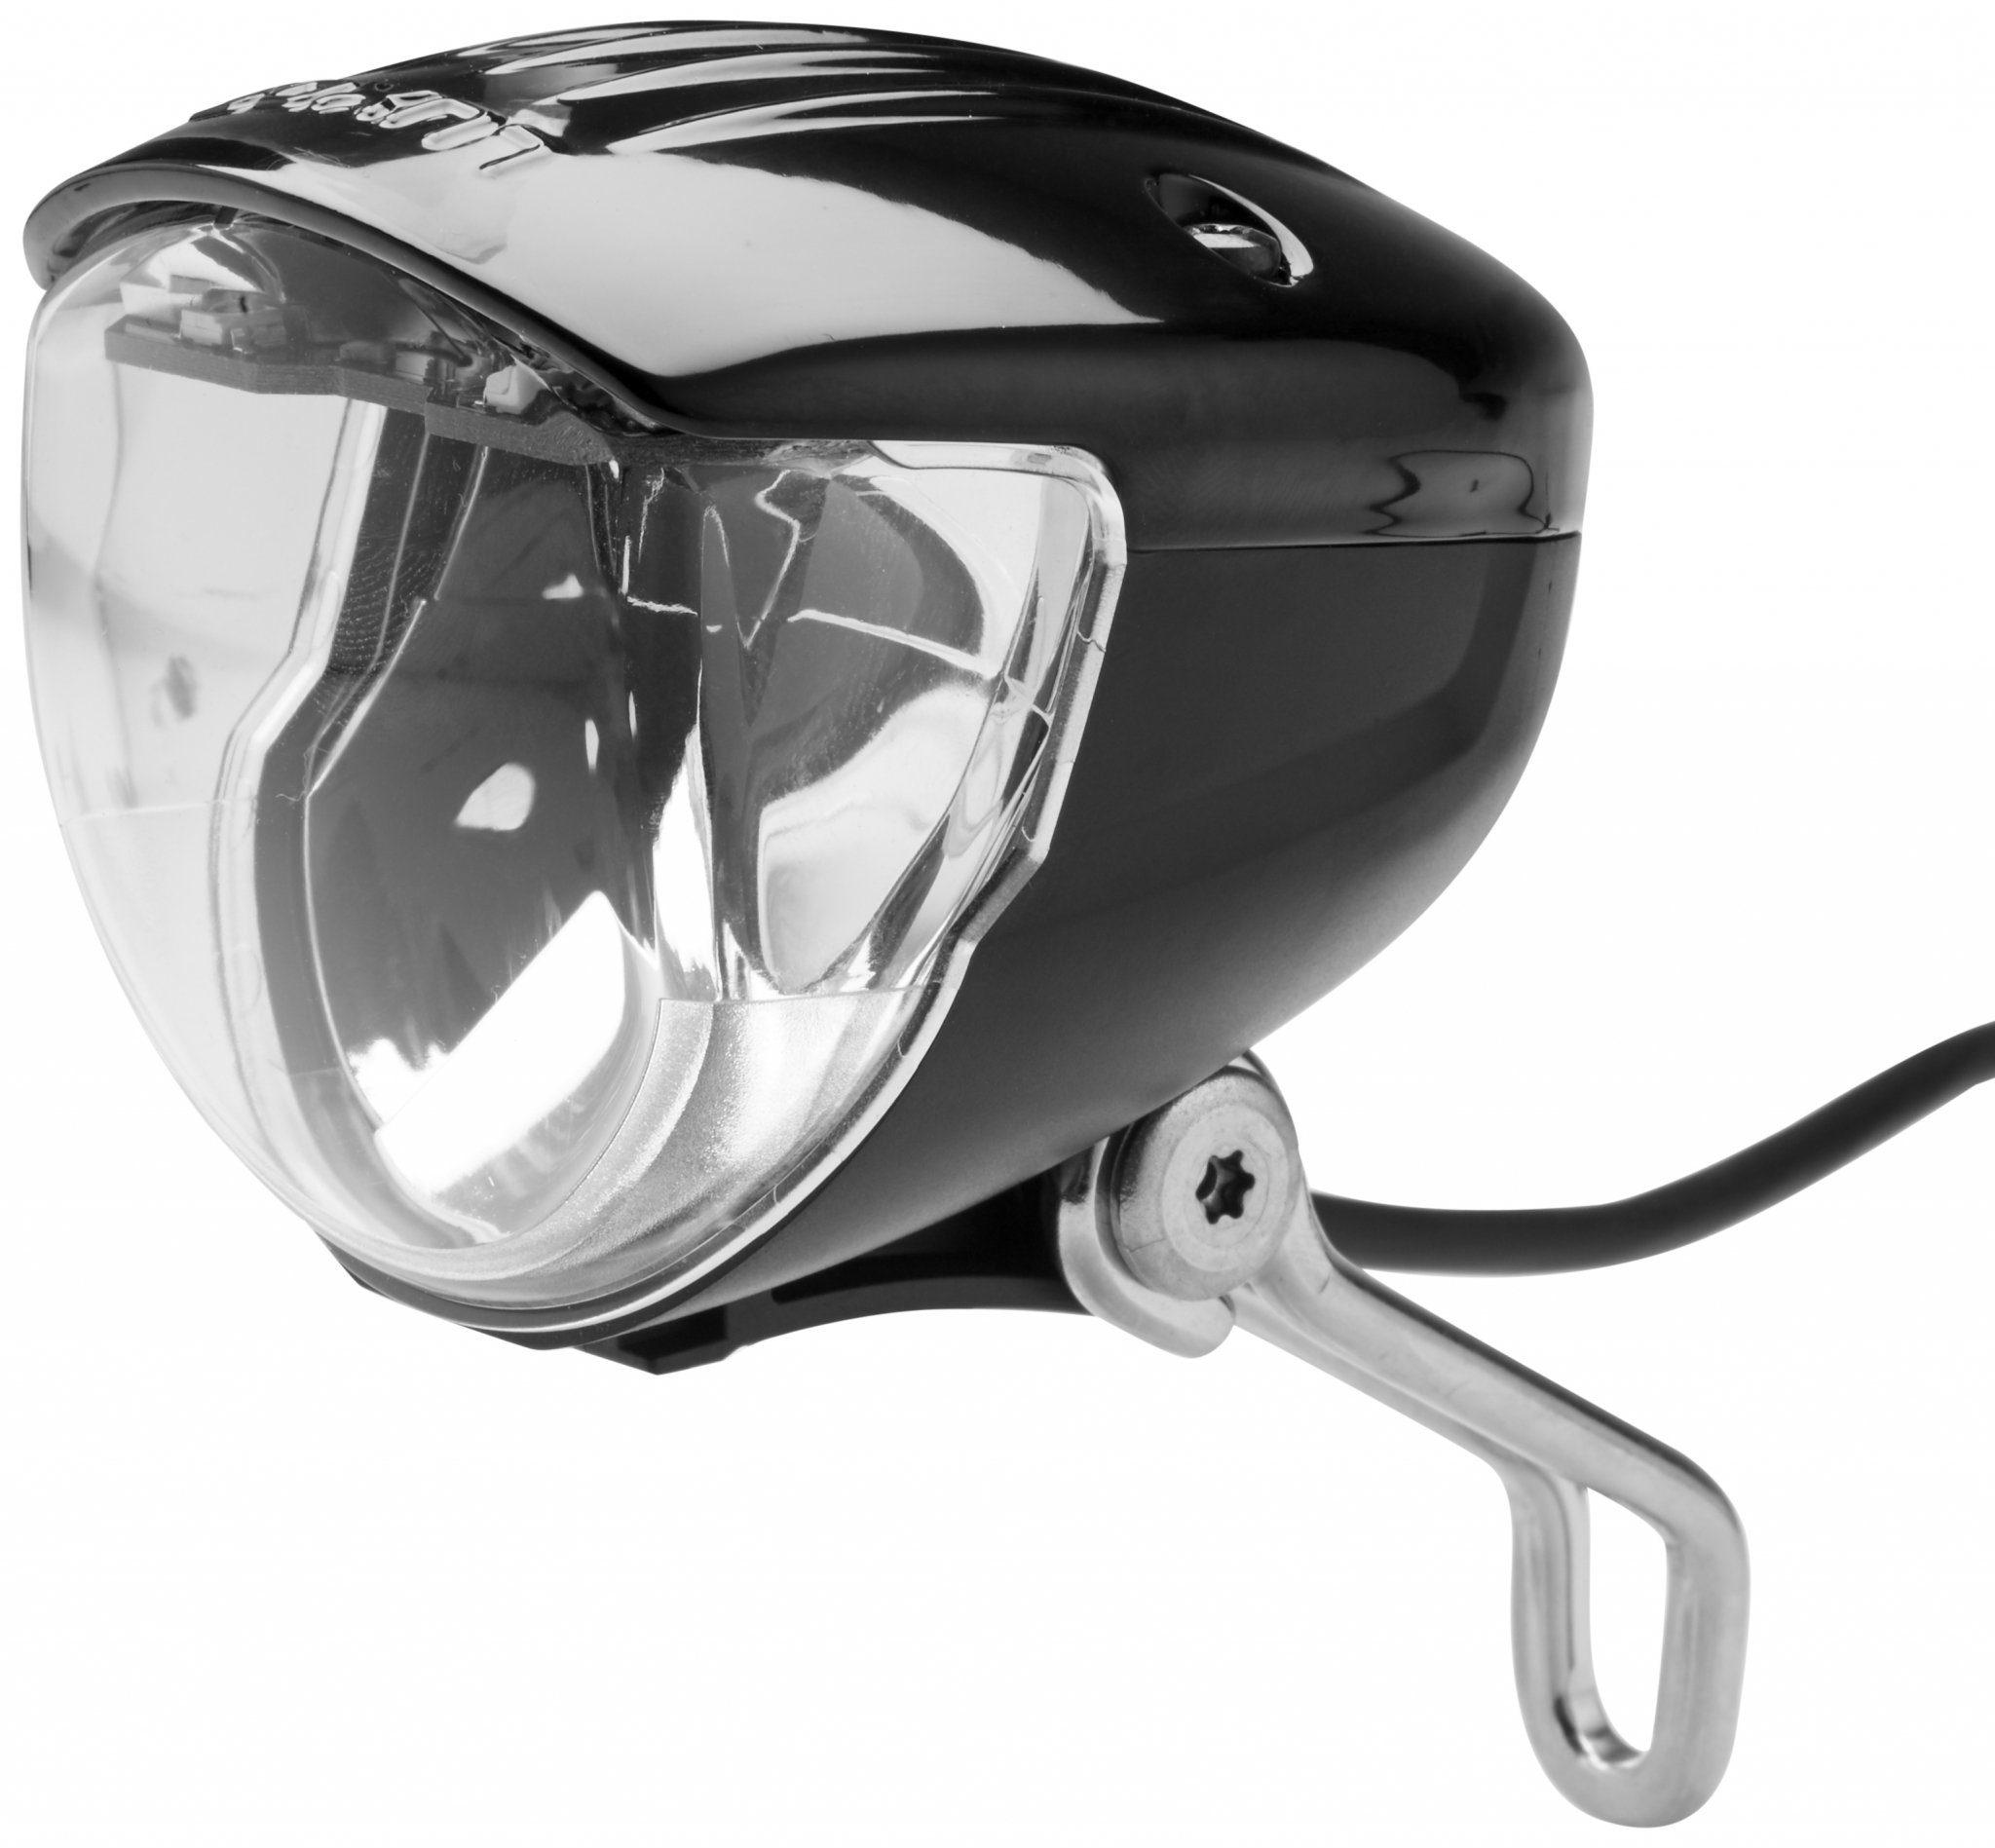 Busch + Müller Fahrradbeleuchtung »Lumotec IQ2 Luxos U Frontscheinwerfer«